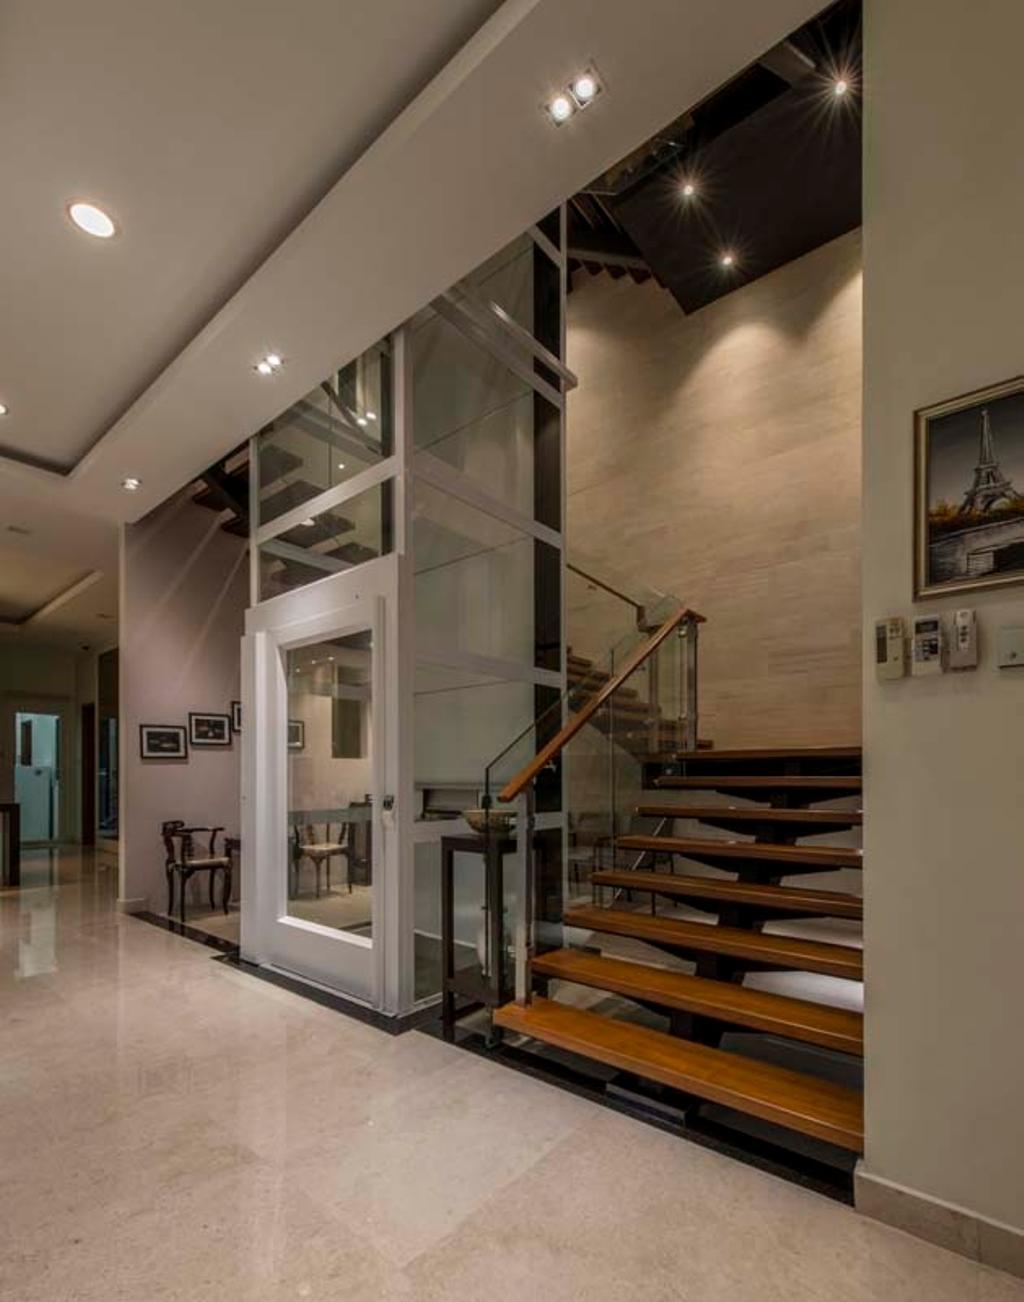 Transitional, Landed, Yunnan Crescent (Block 124), Interior Designer, Posh Living Interior Design, Own Lights, Lift, Stairs, Tiles, Staircase, Elevator, Banister, Handrail